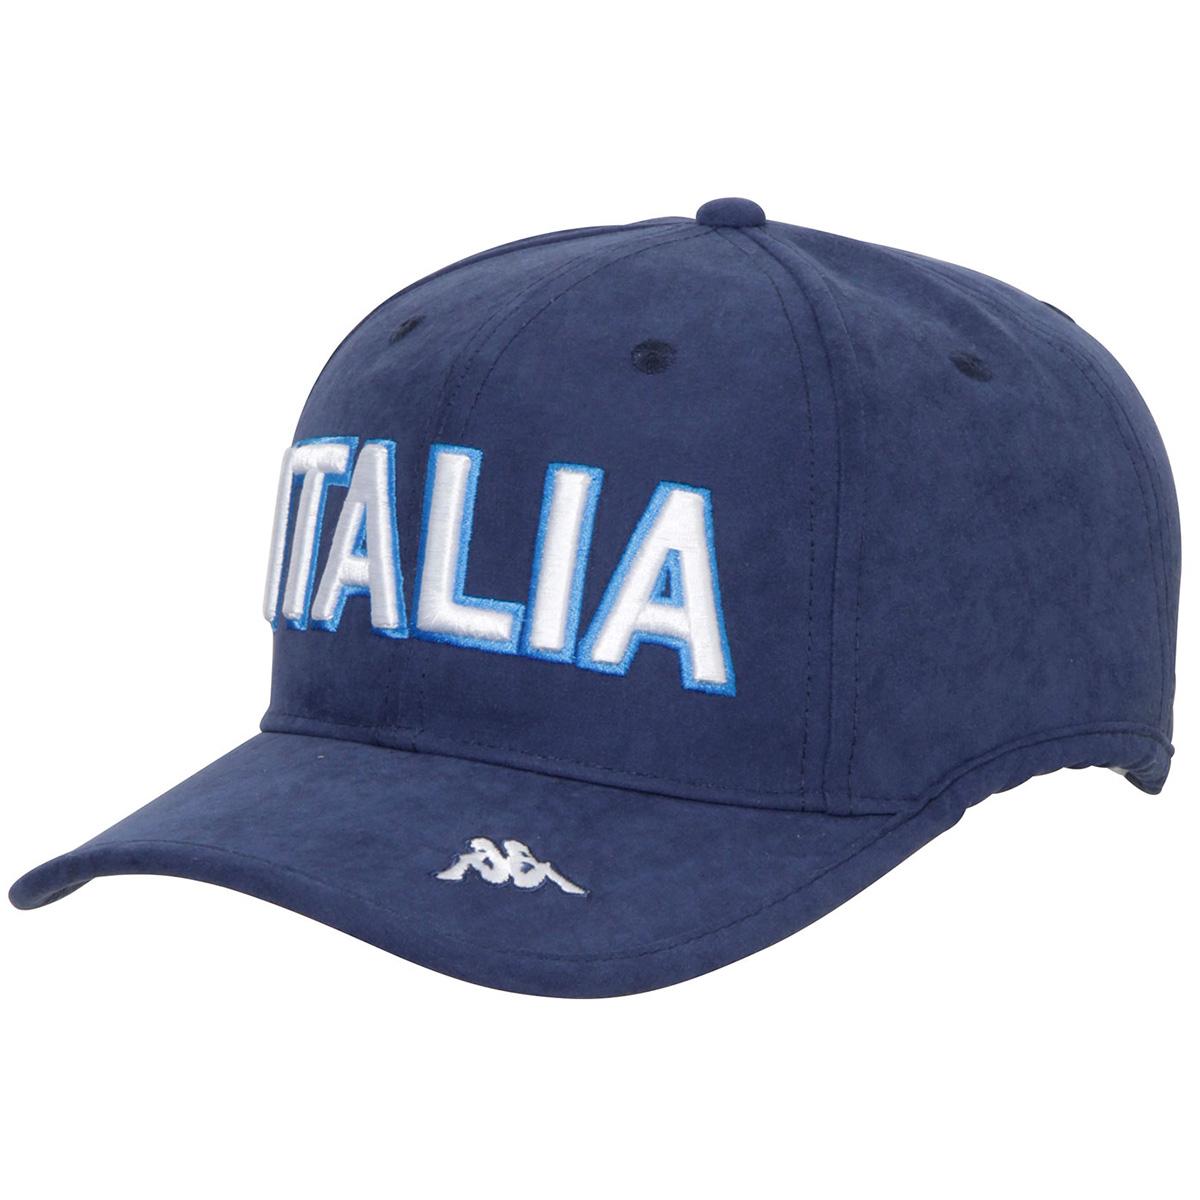 ITALIA ロゴキャップ